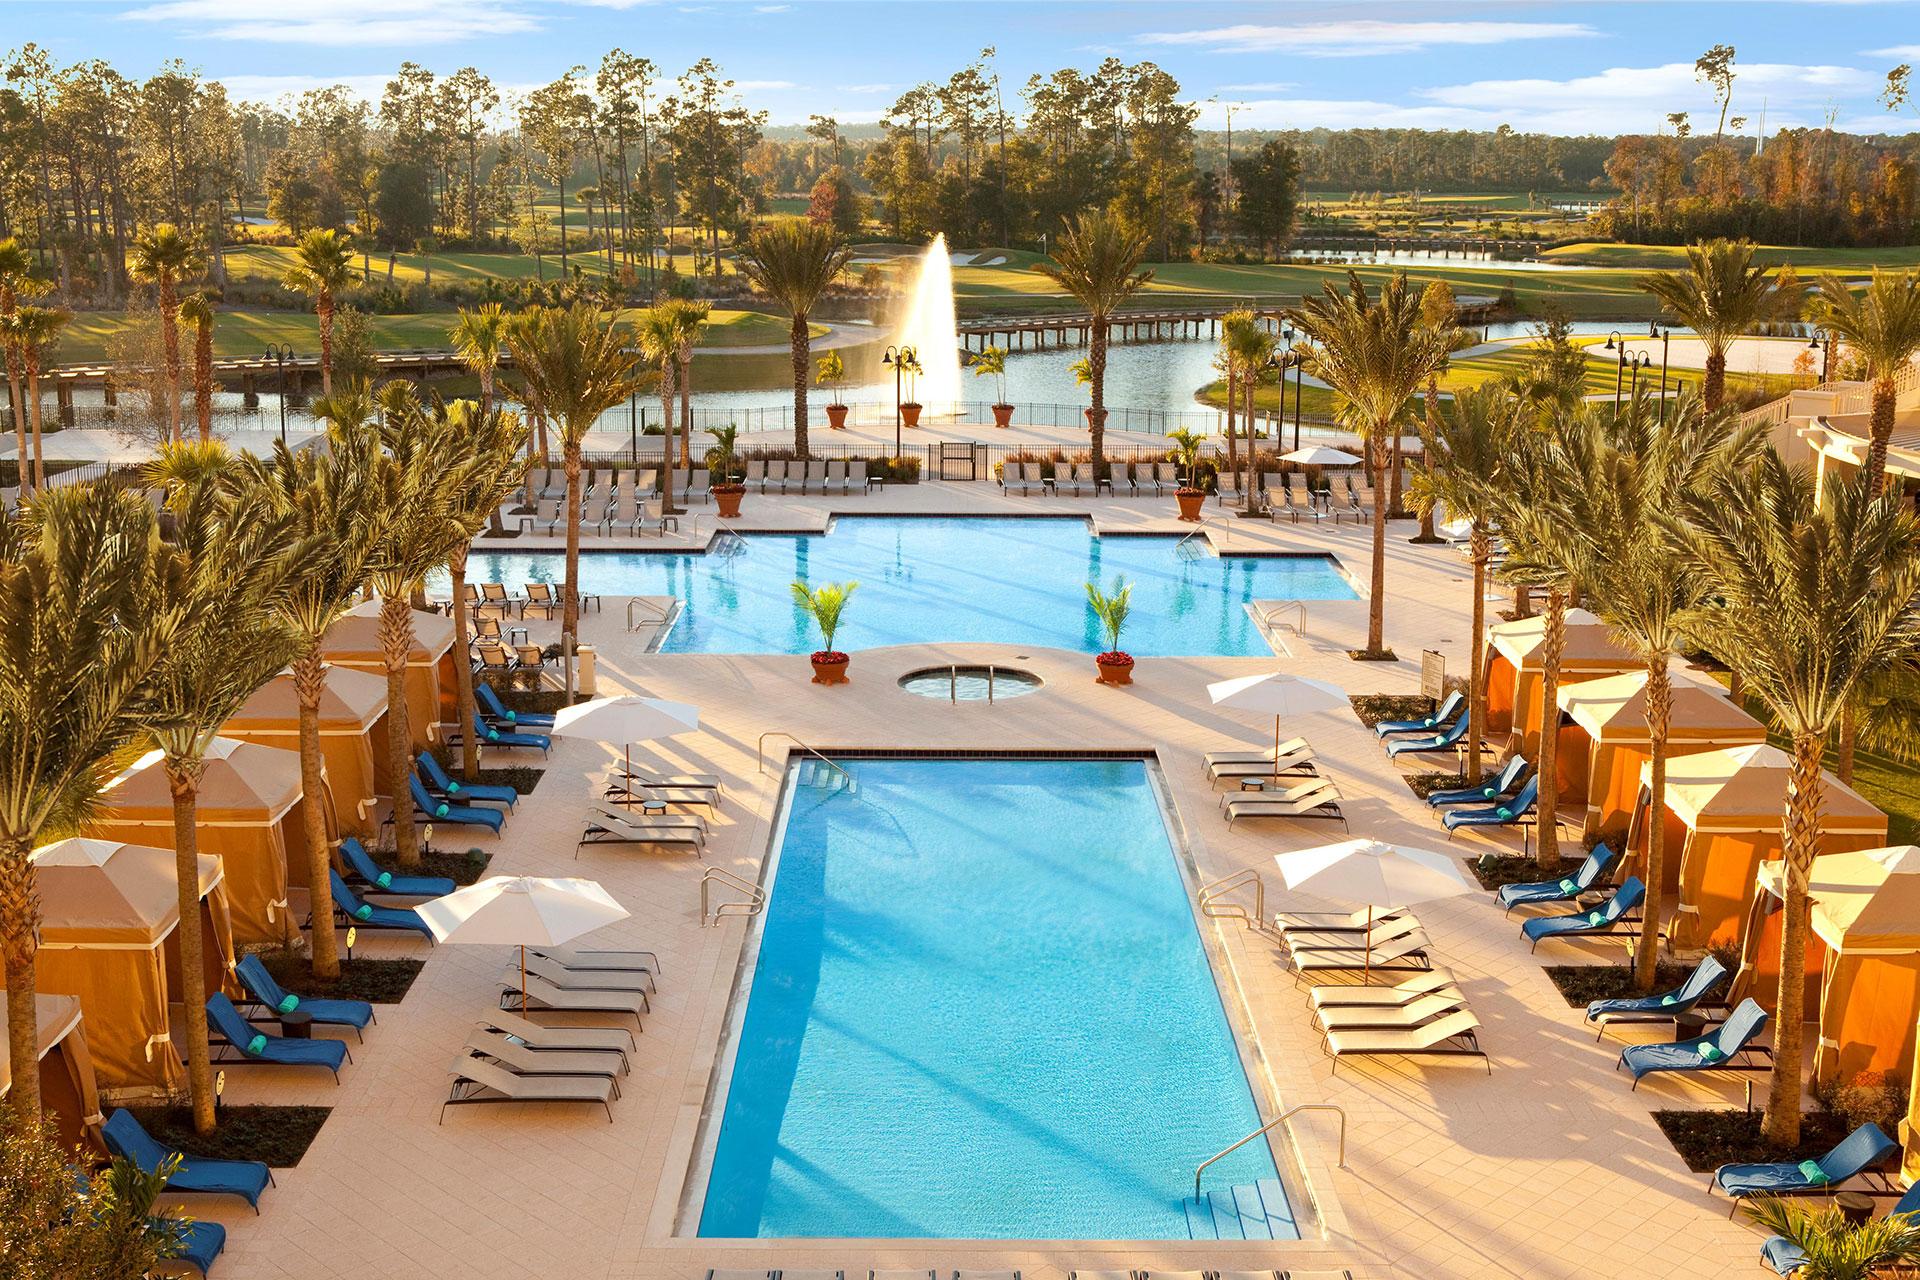 Waldorf Astoria Orlando Pool; Courtesy of Waldorf Astoria Orlando